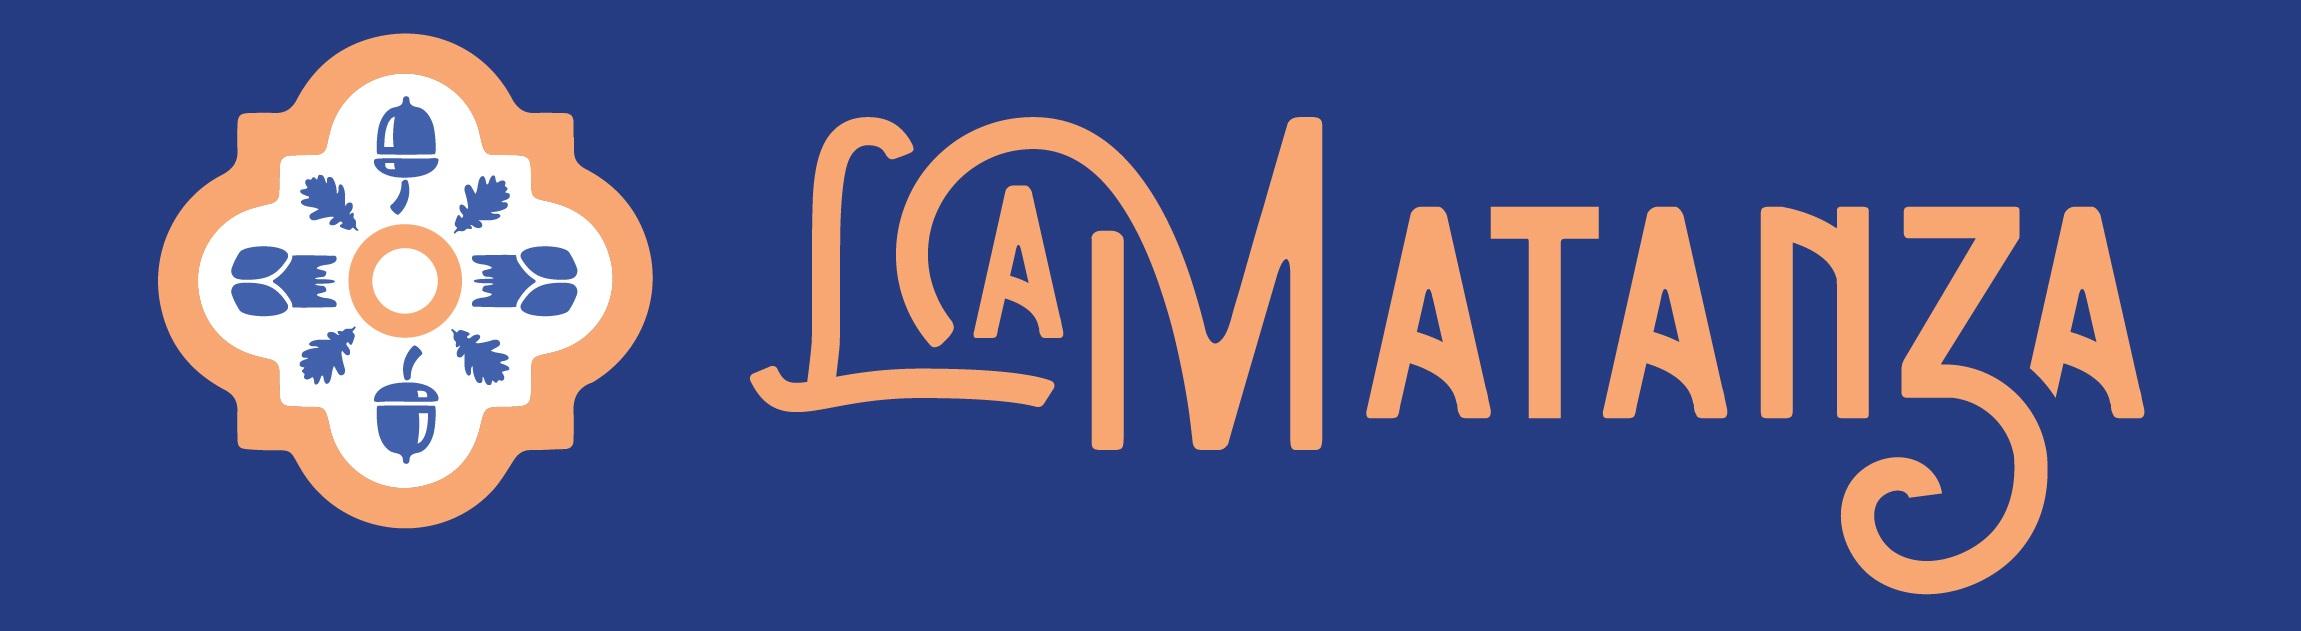 LaMatanza+Logo+Master-01.jpg